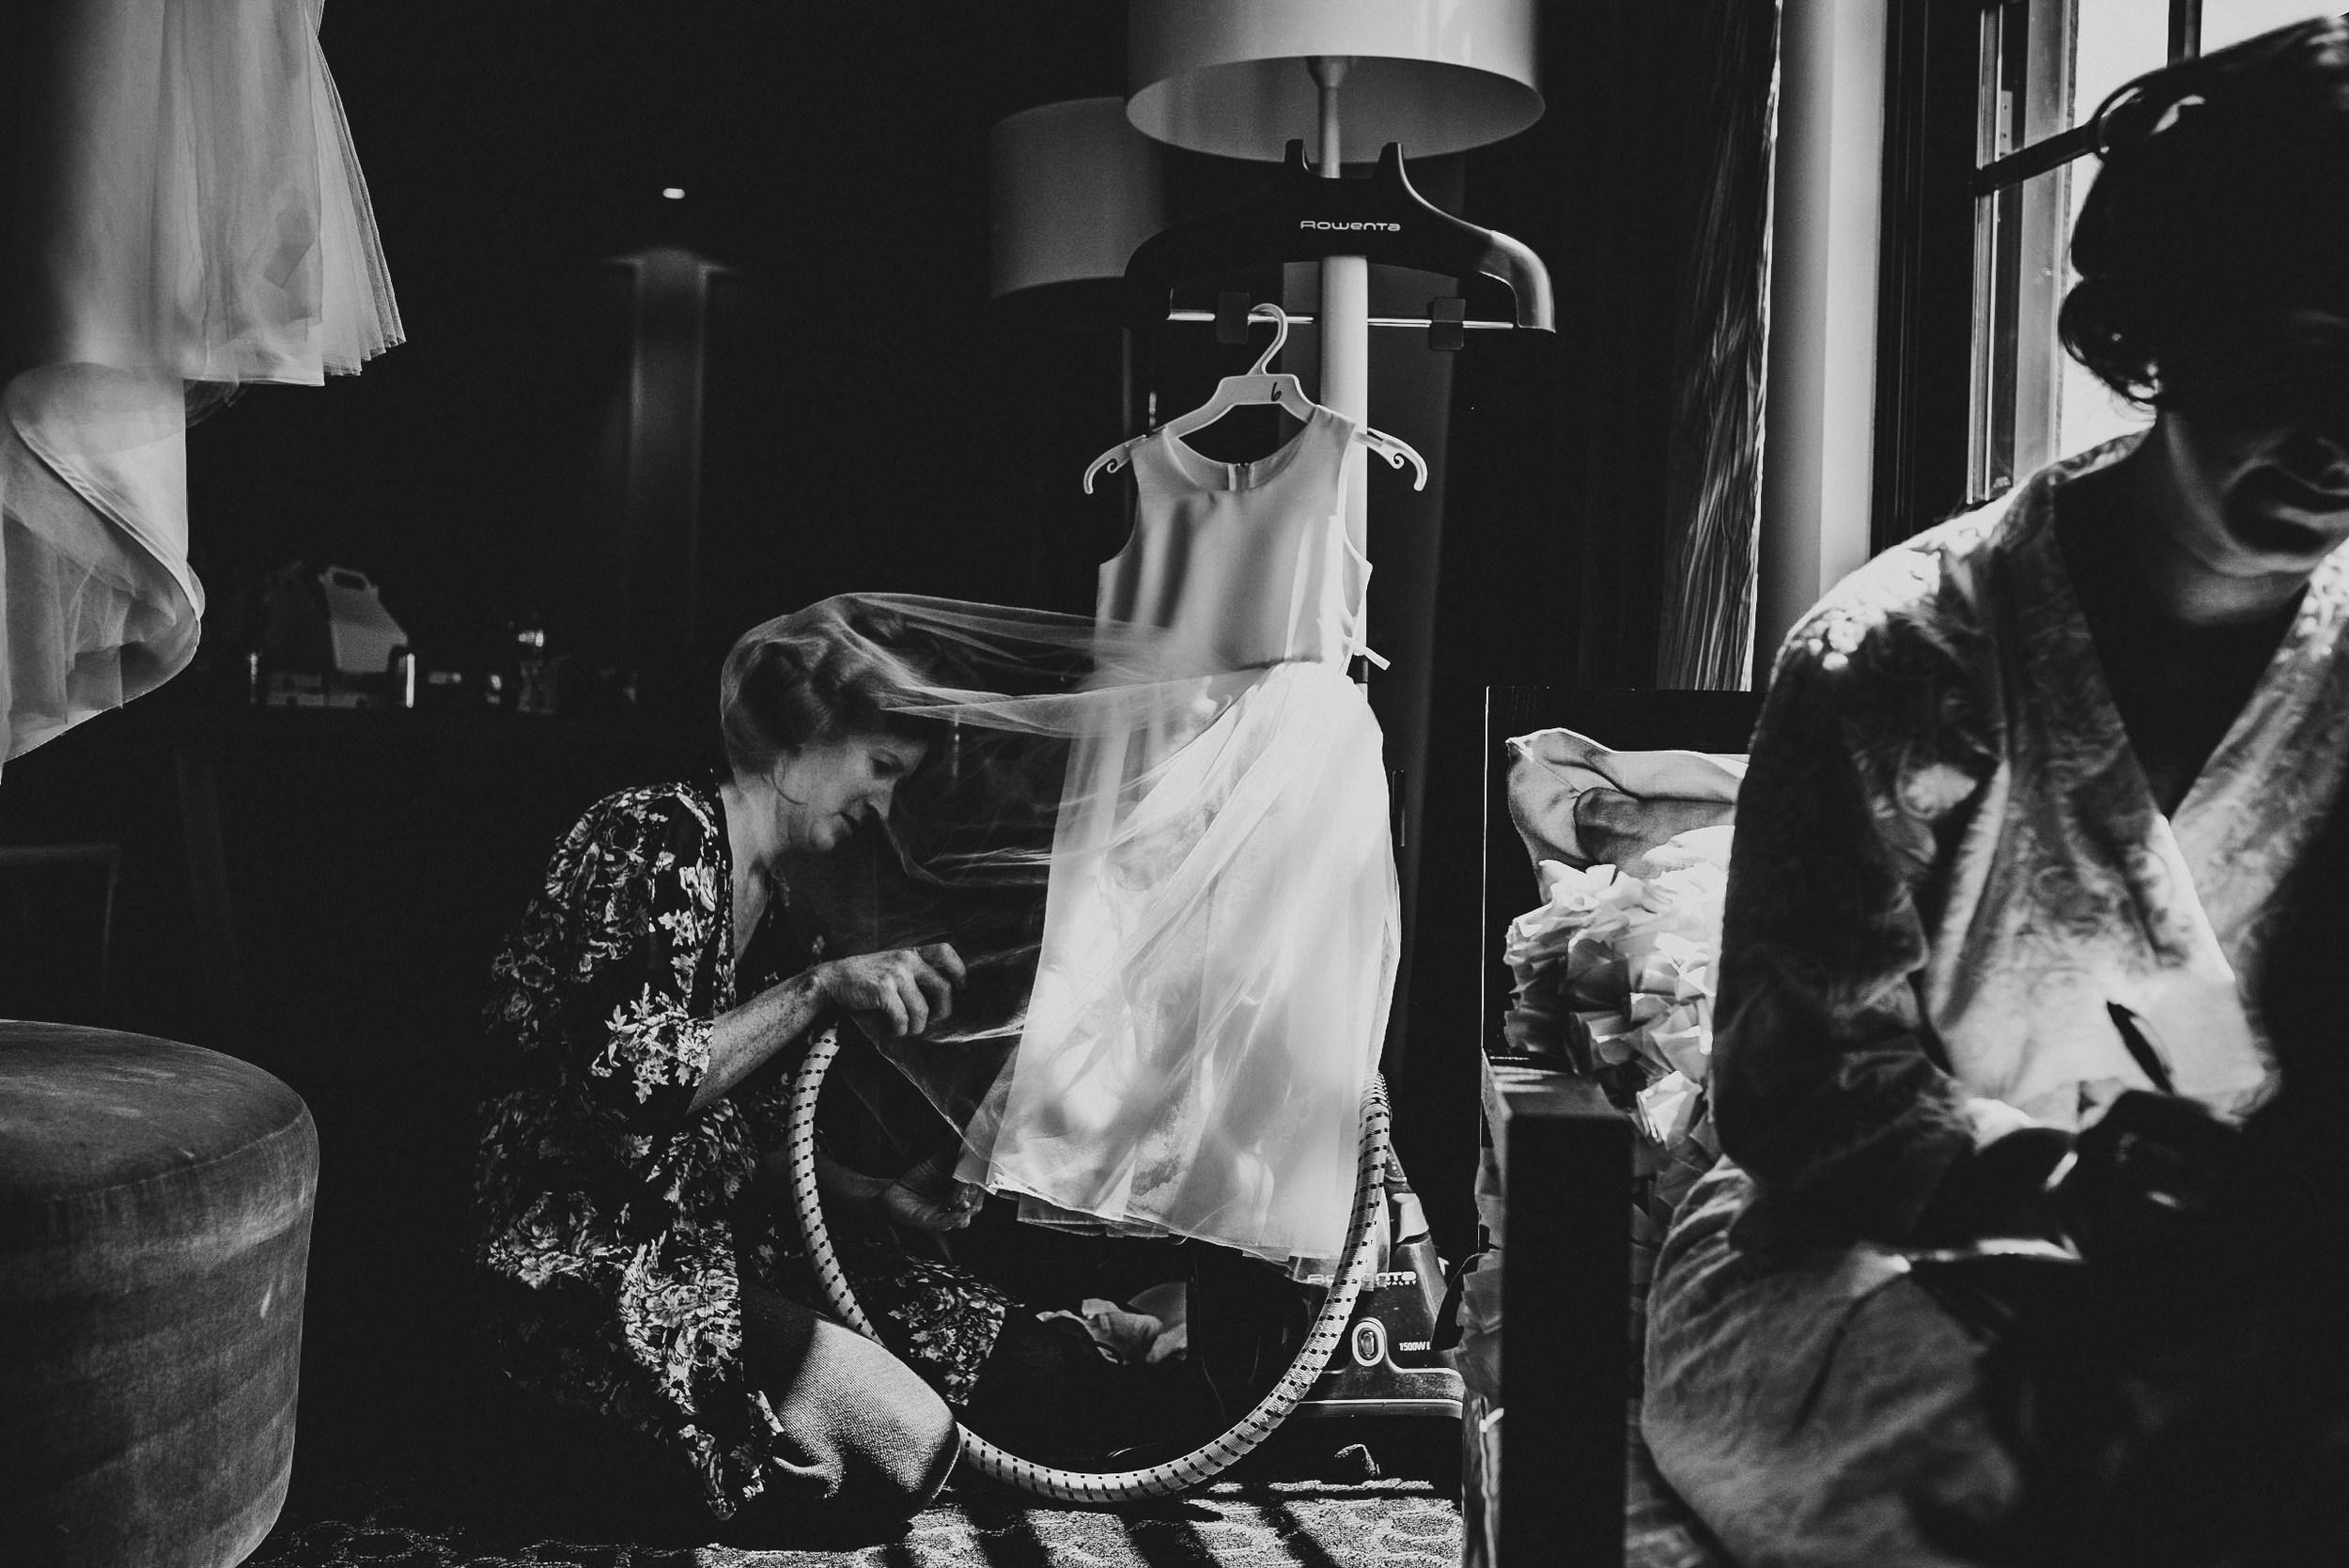 Wedding at W Hotel Washington DC by Mantas Kubilinskas-3.jpg